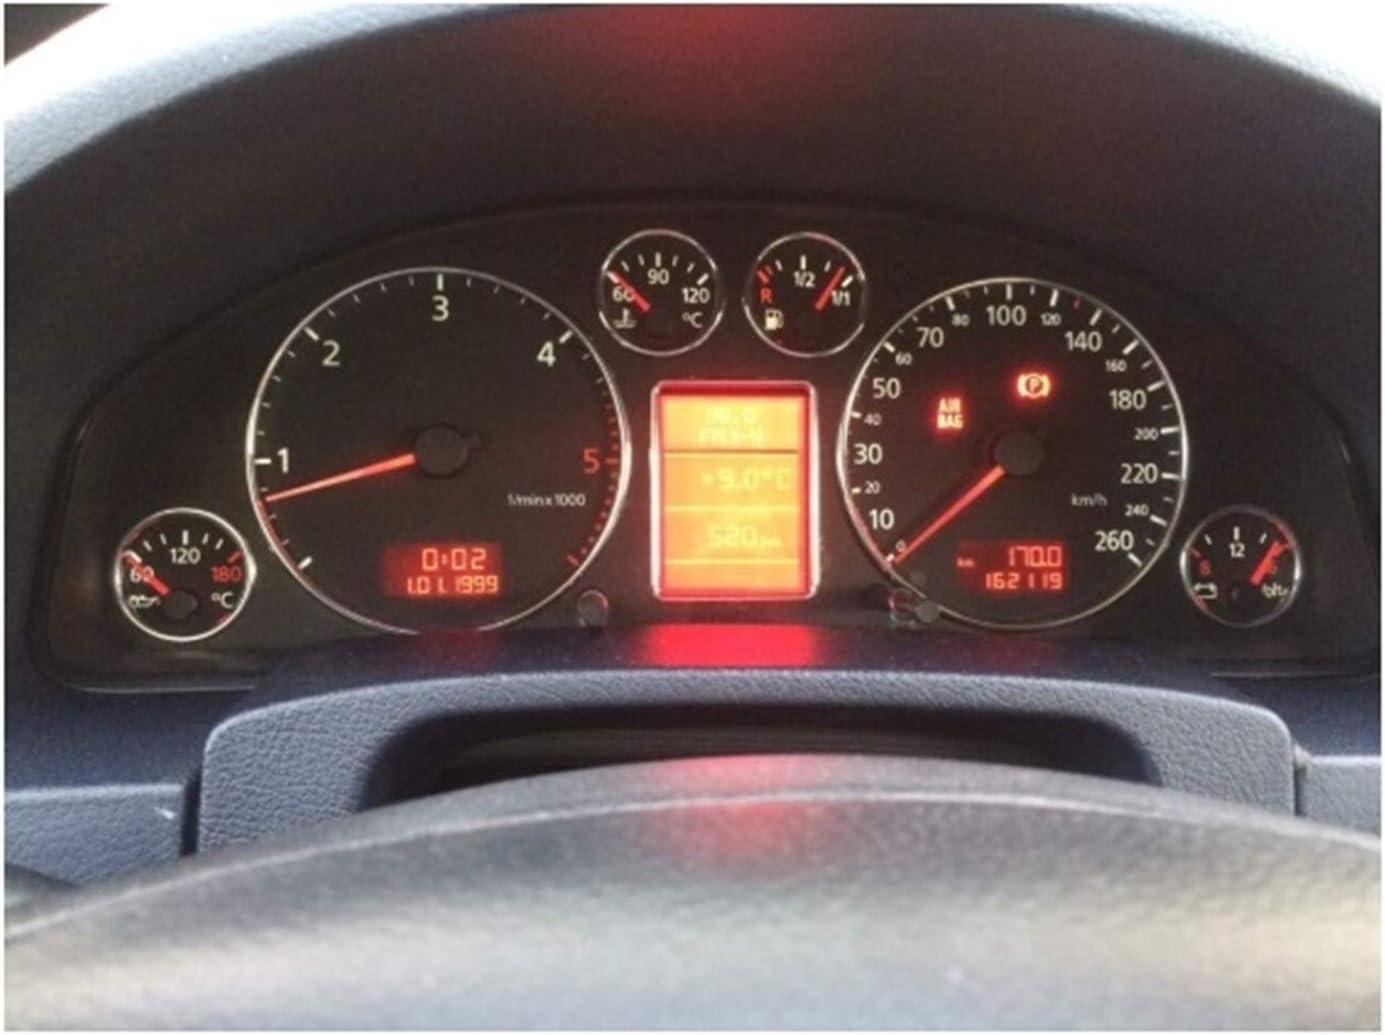 Claral Chrome Veloc/ímetro medidor de cuadrante Anillo Instrumento Anillo Panel for Audi A3 8L A4 8D B5 A6 4B C5 Claral